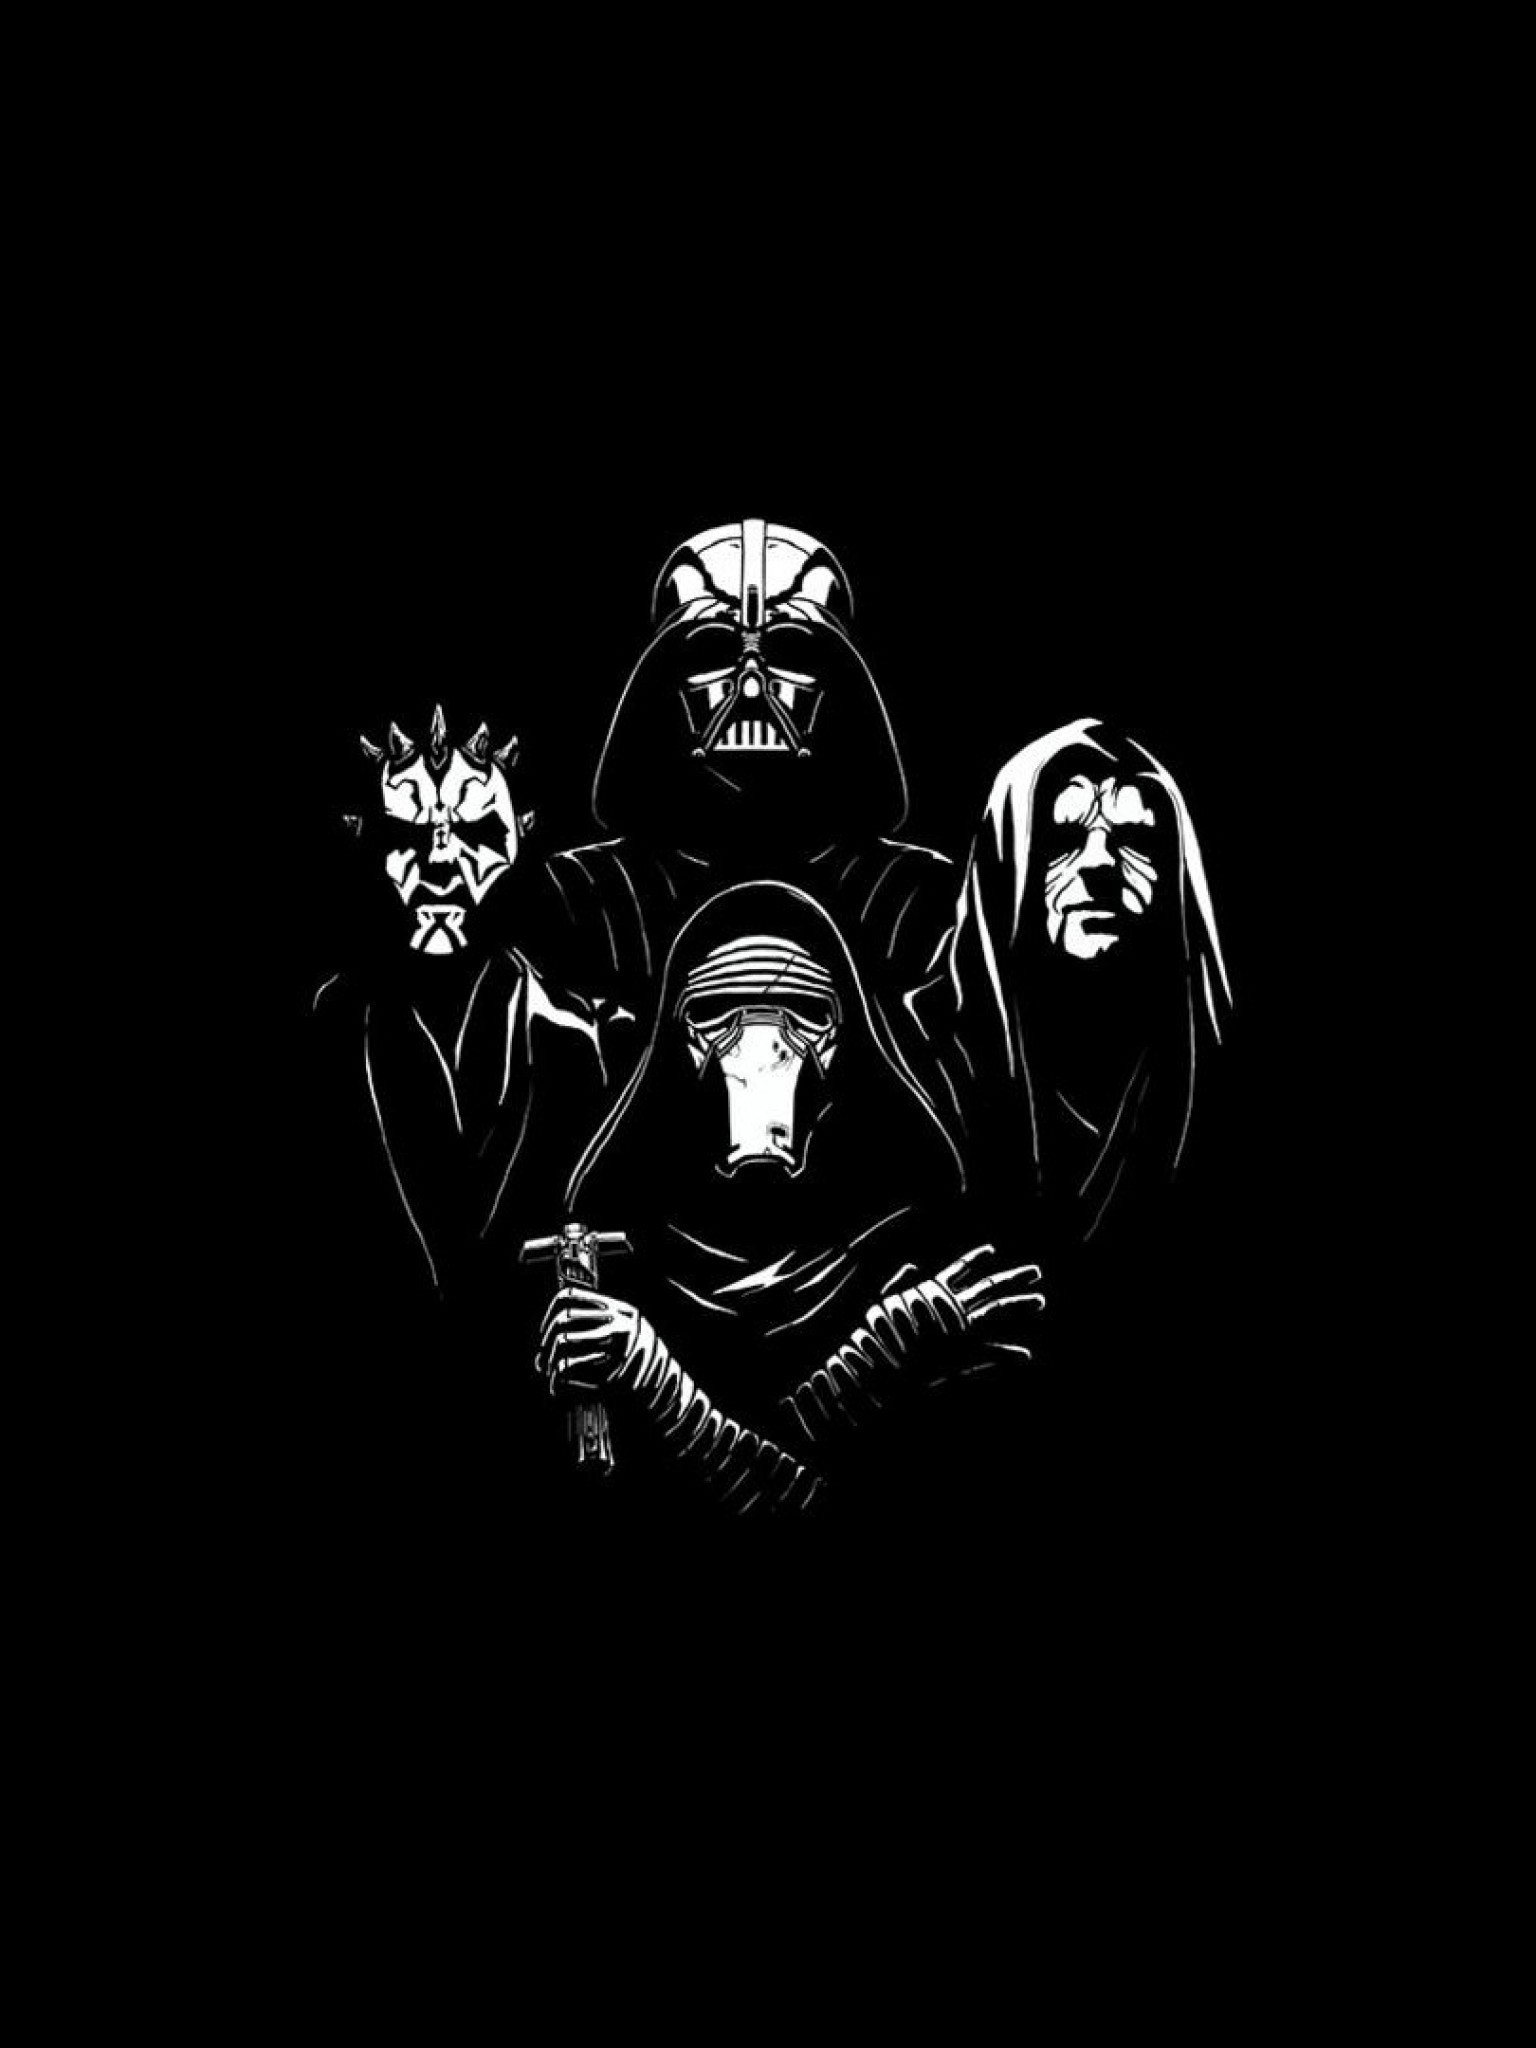 Star Wars Wallpaper Ipad 69 Images